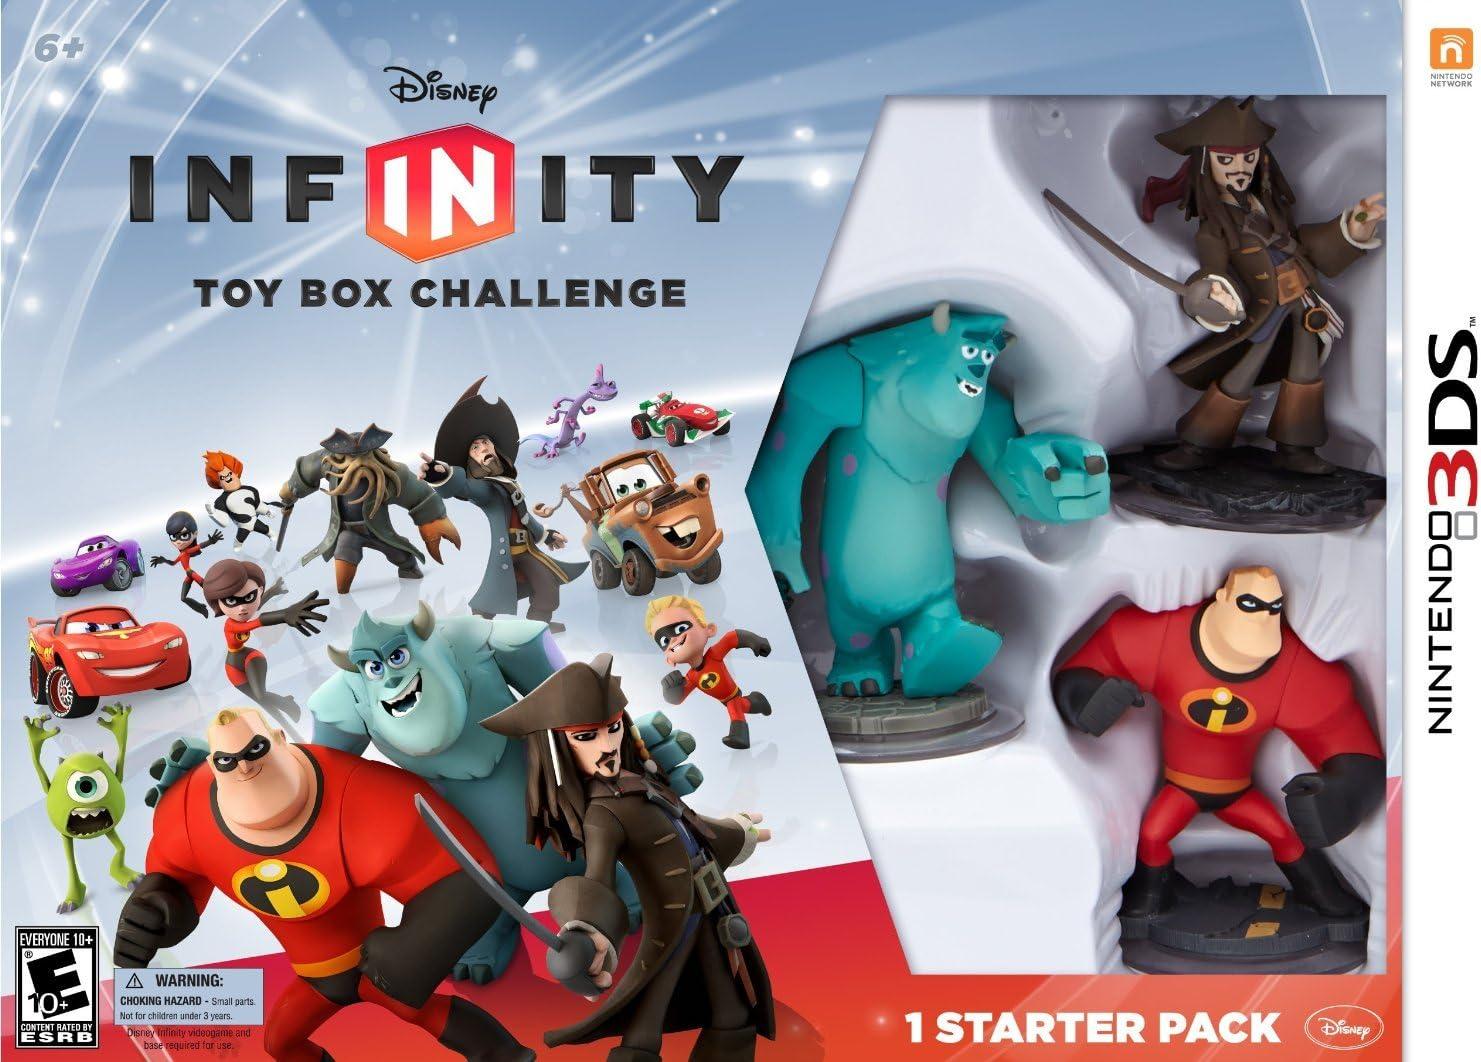 Disney Infinity 1.0 Starter Pack Playset Web Code Card